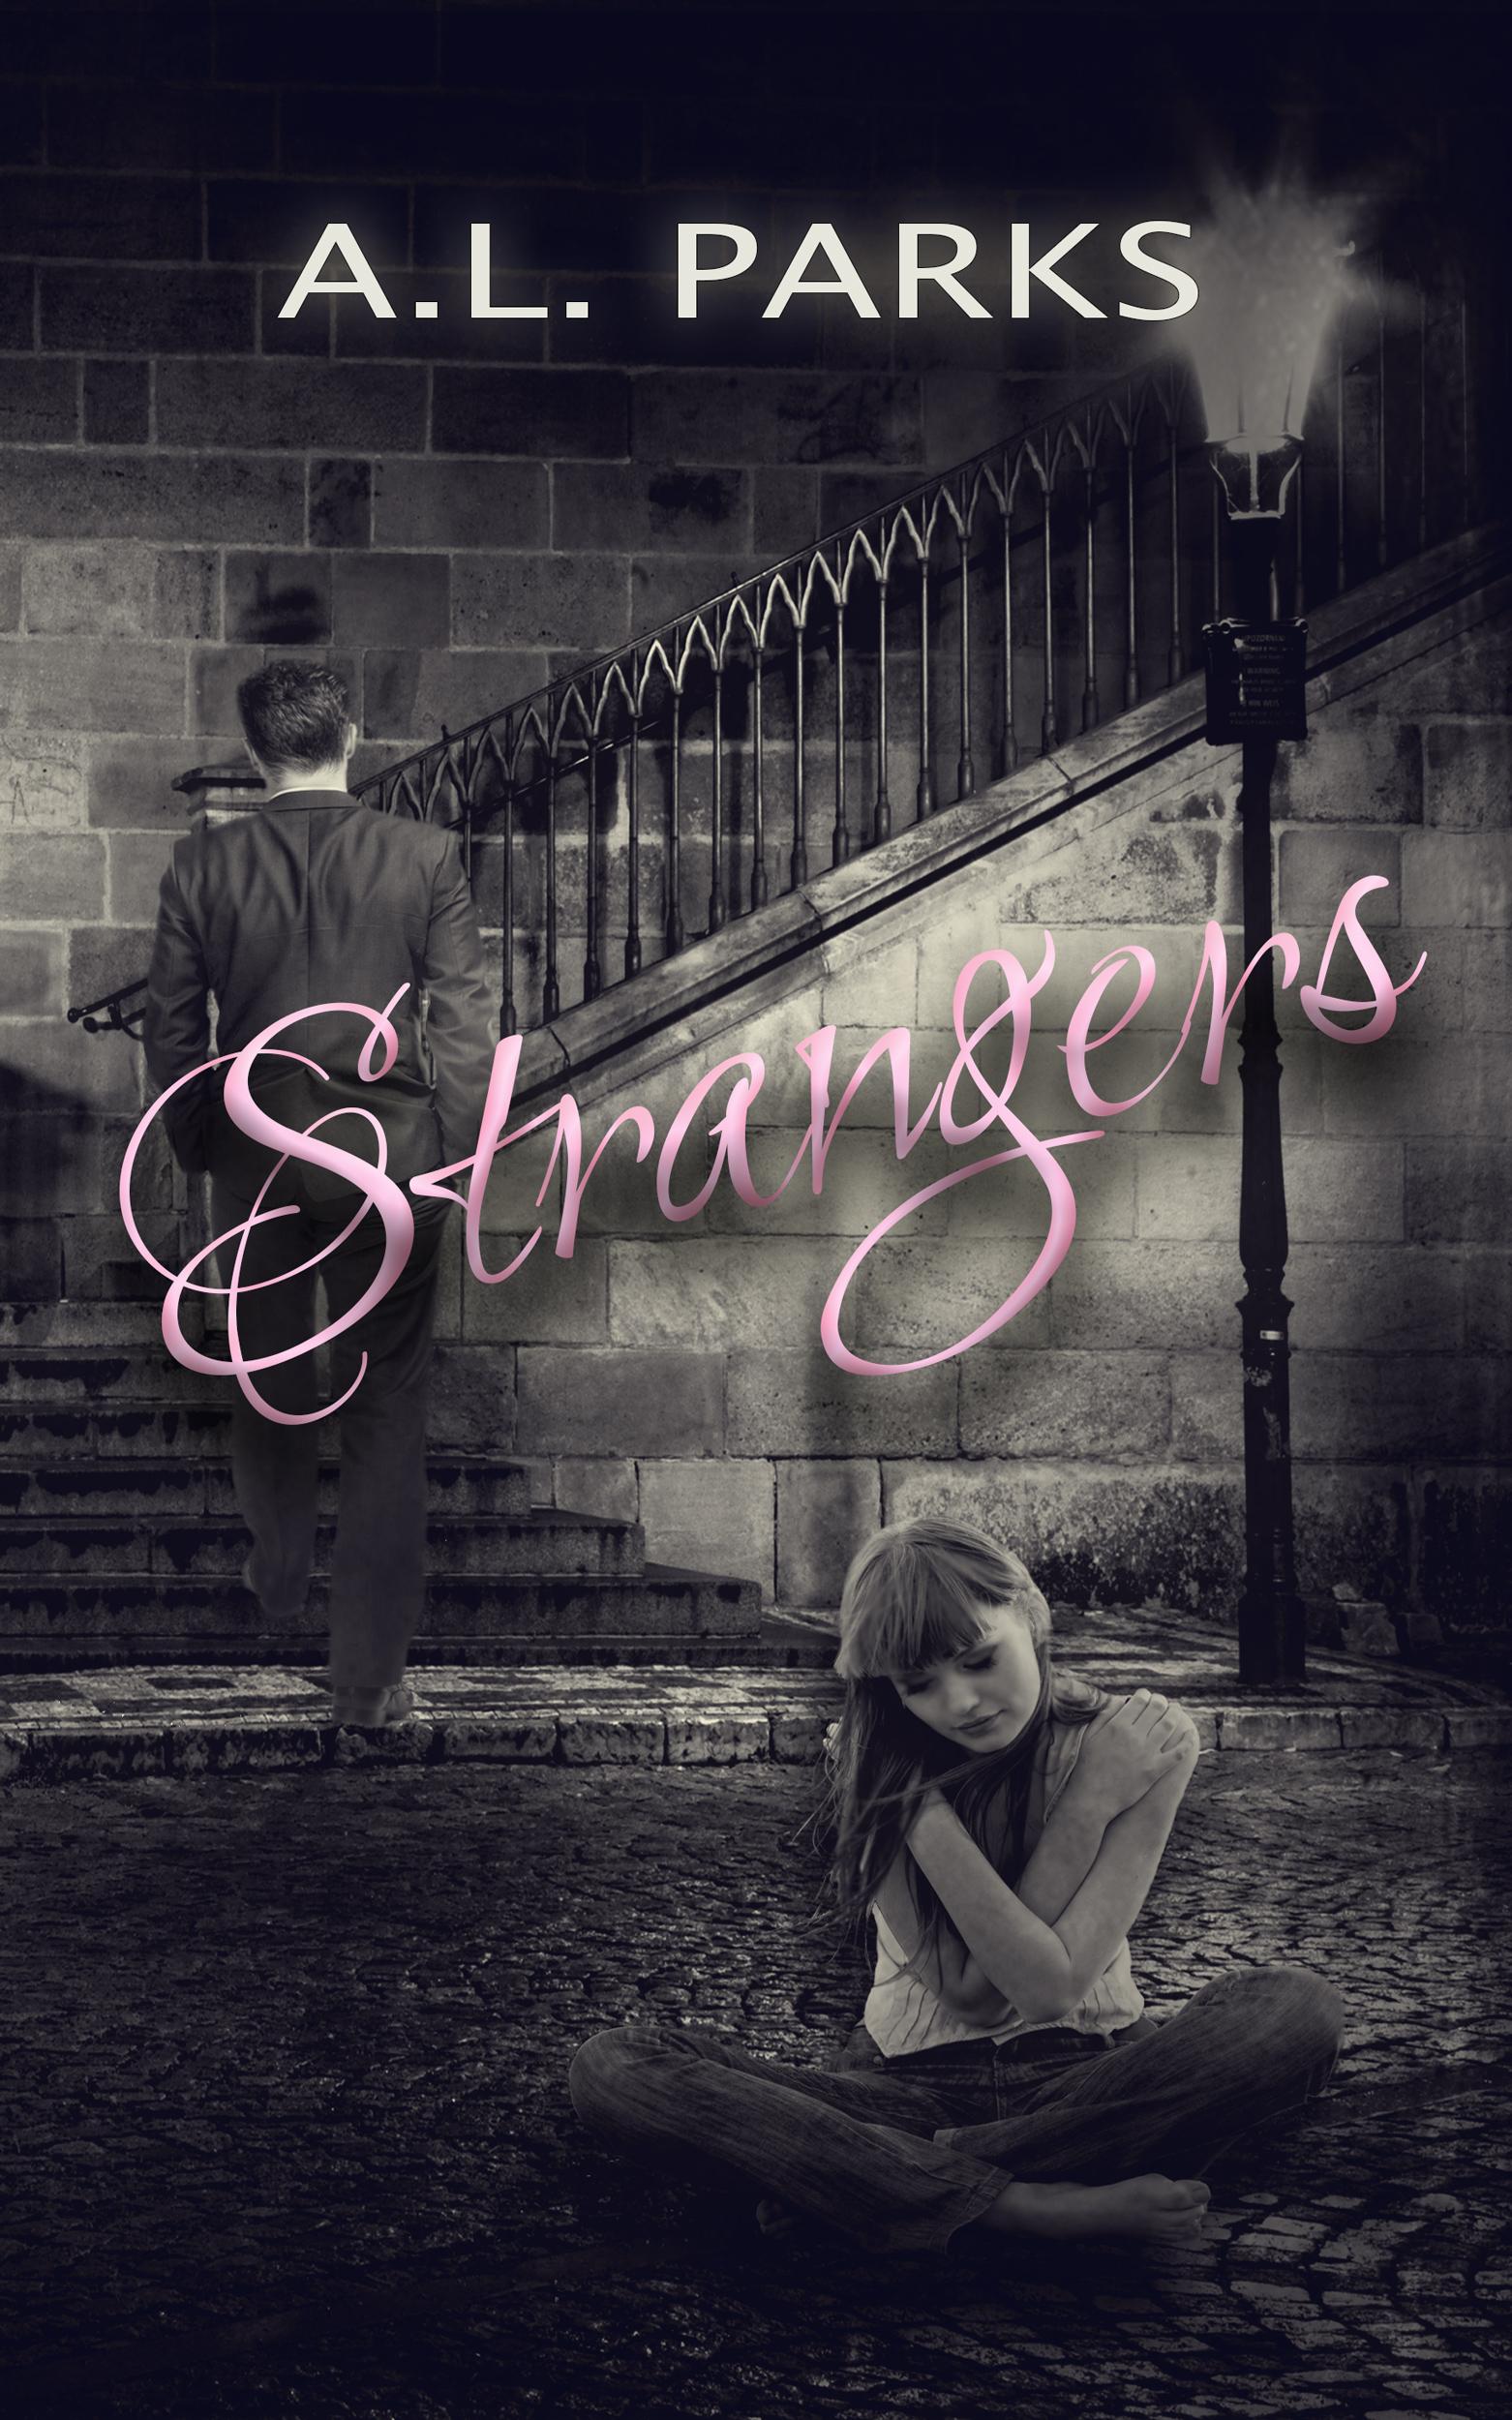 Strangers_AL_Parks_kindle